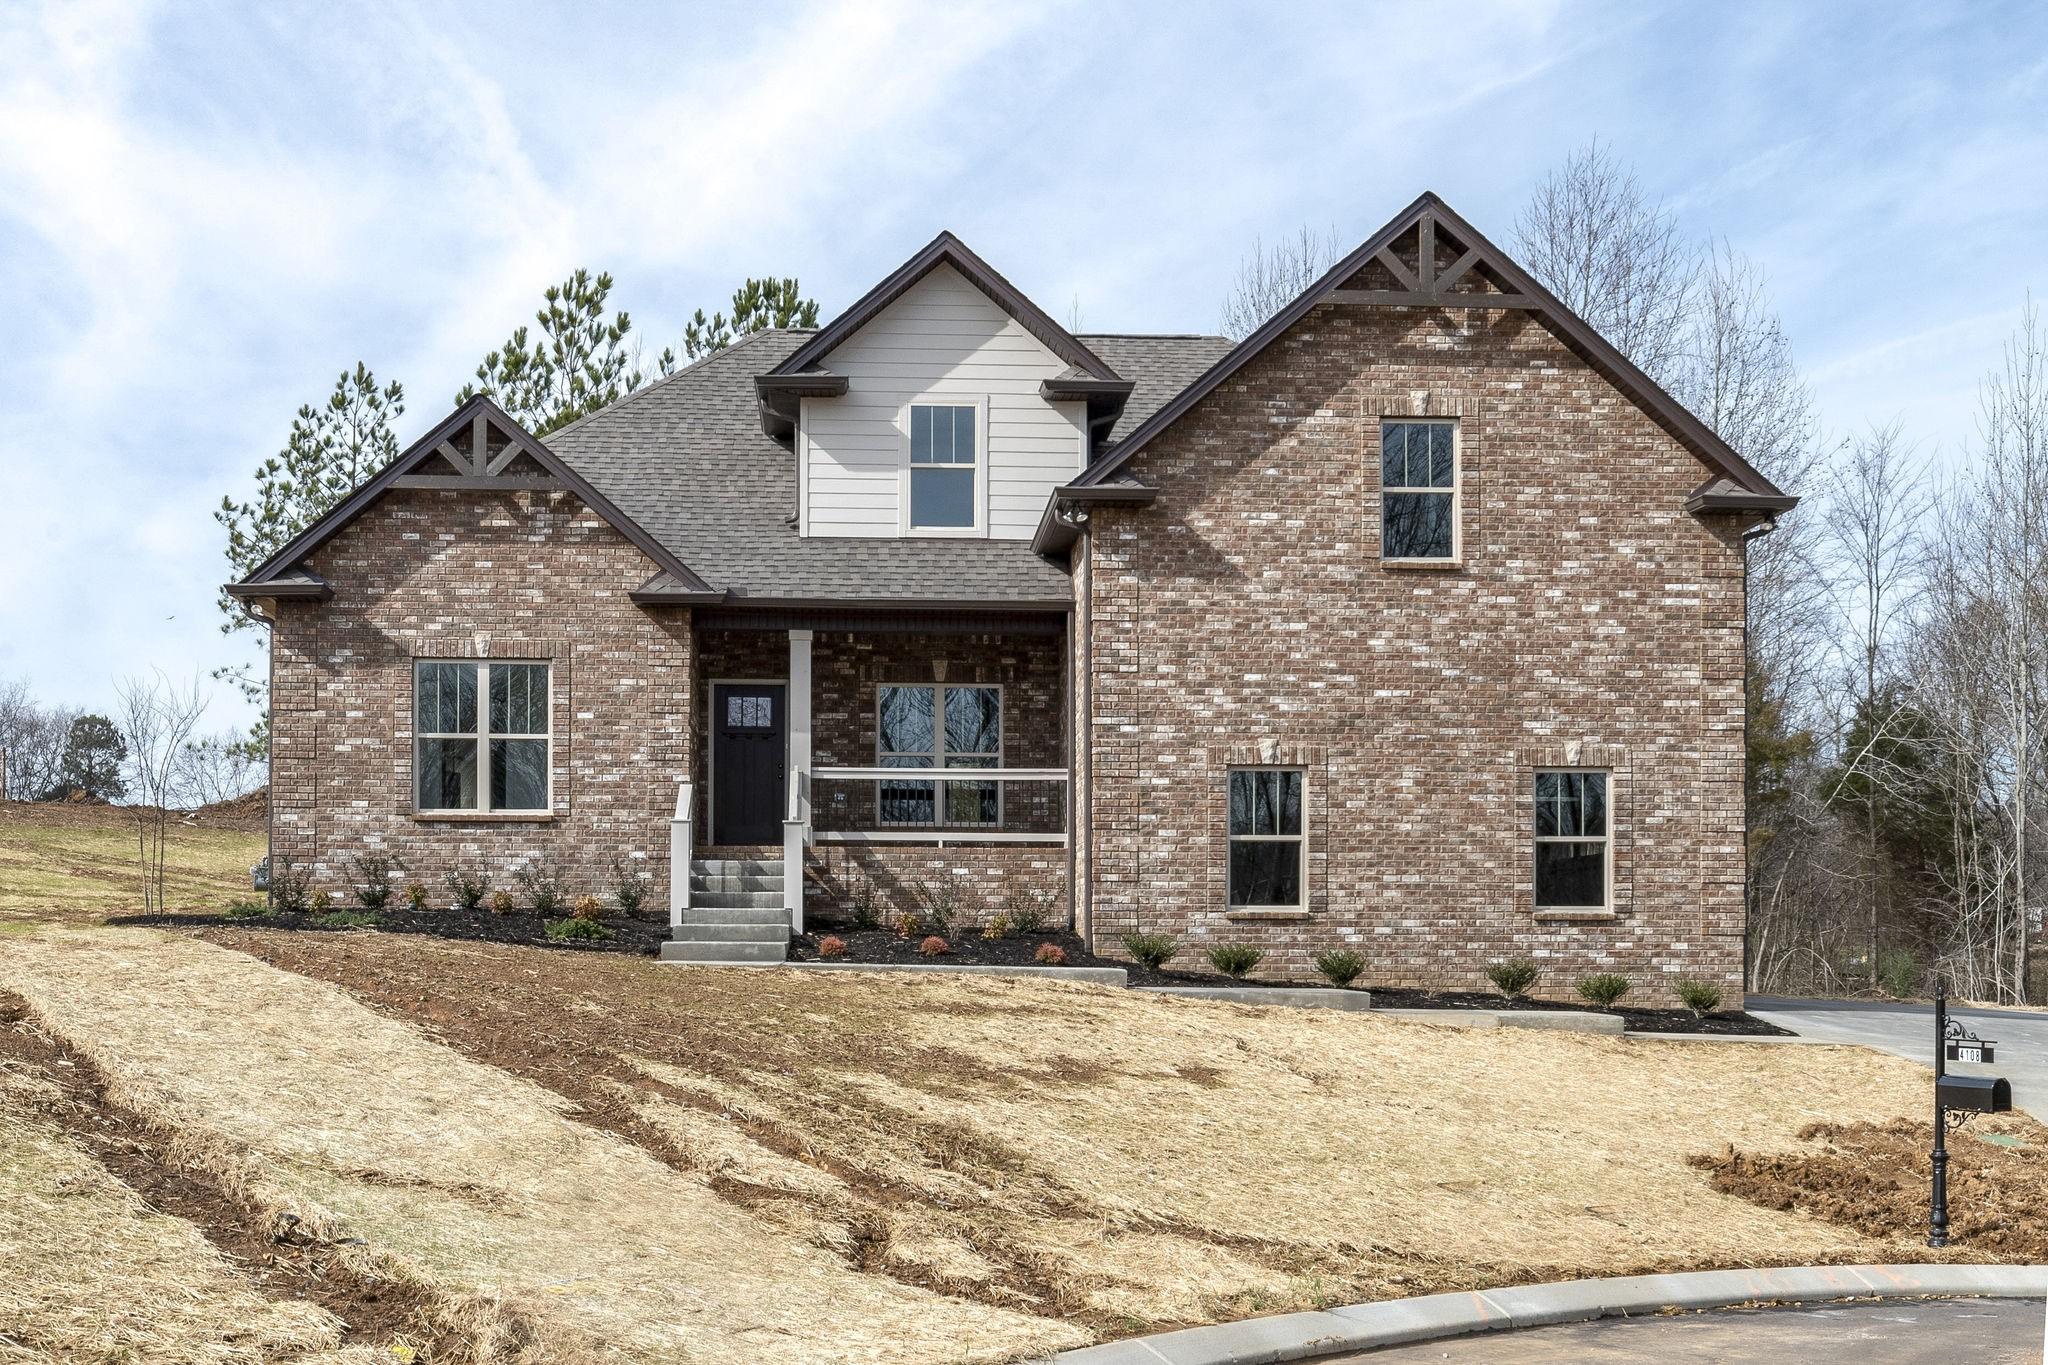 4108 Pilgrim Trl Property Photo - Greenbrier, TN real estate listing